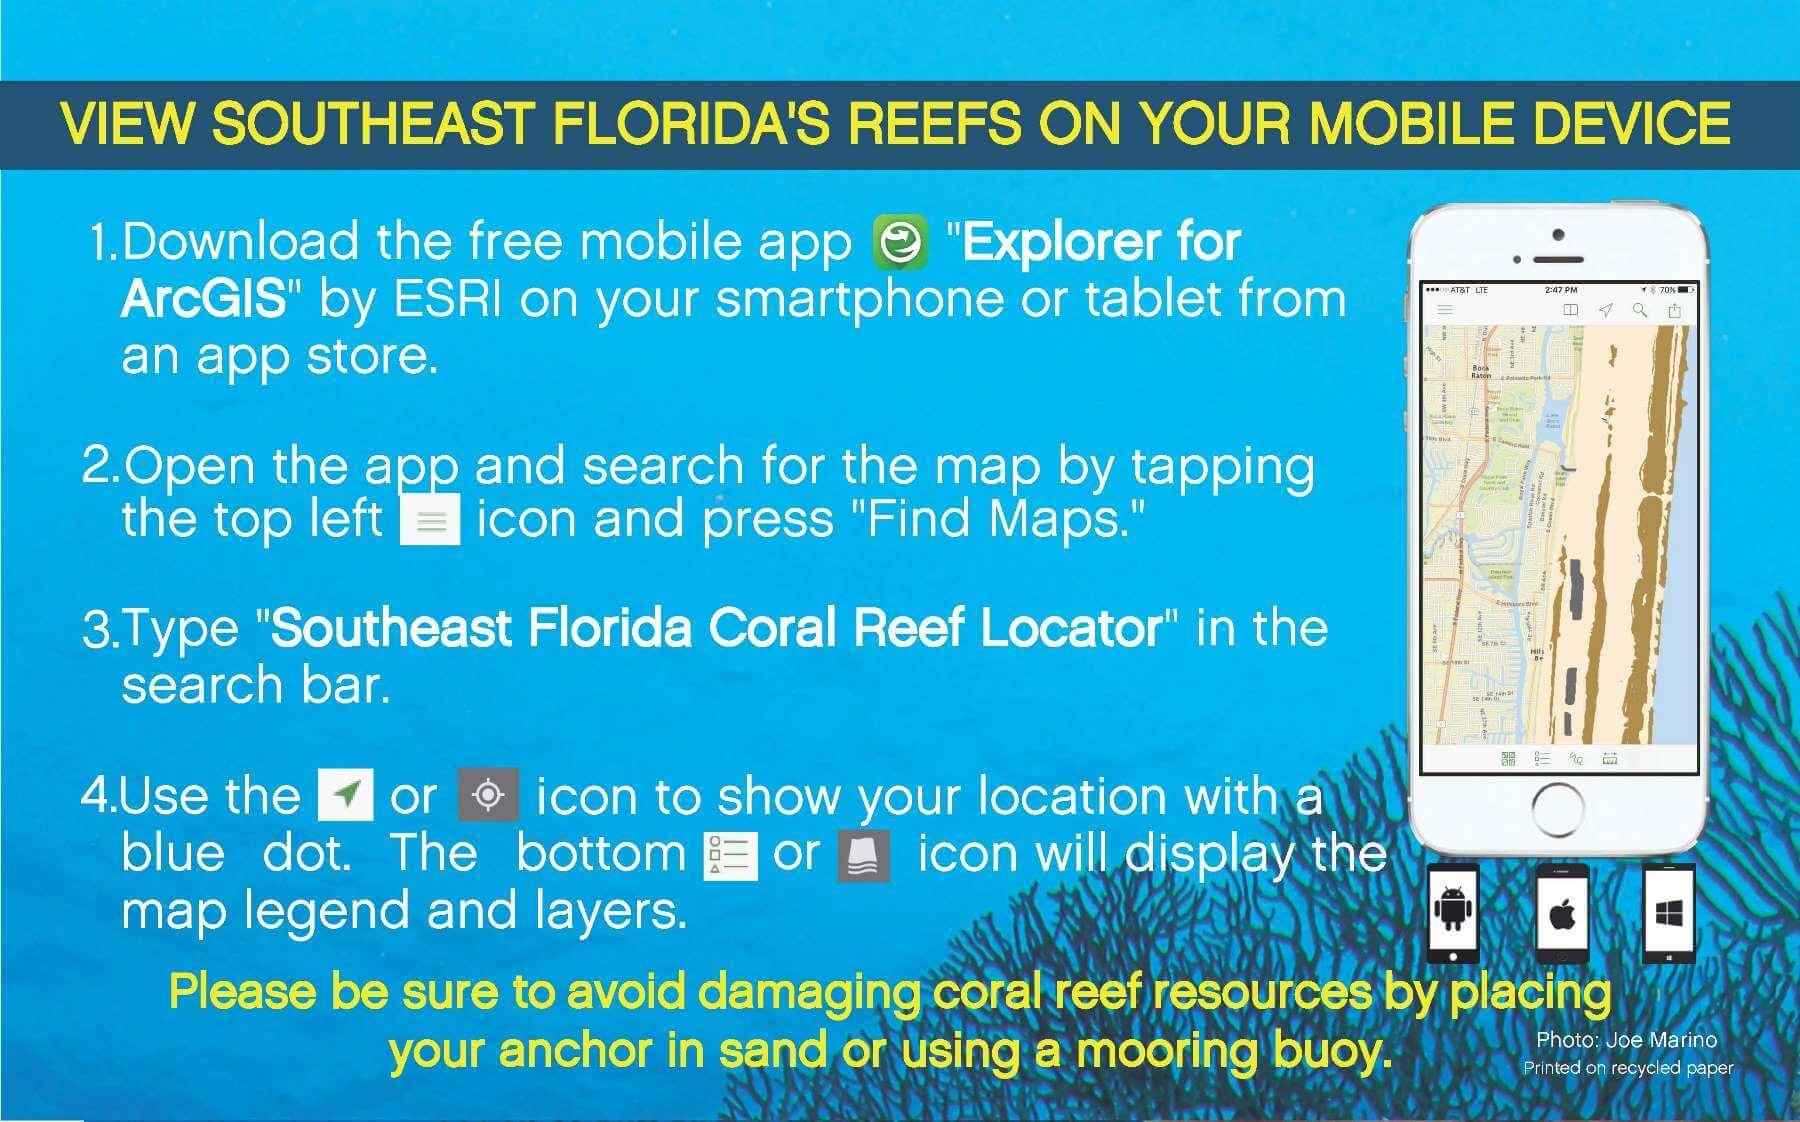 Southeast Florida Reefs Maps - South East Florida Reefs - Florida Reef Maps App